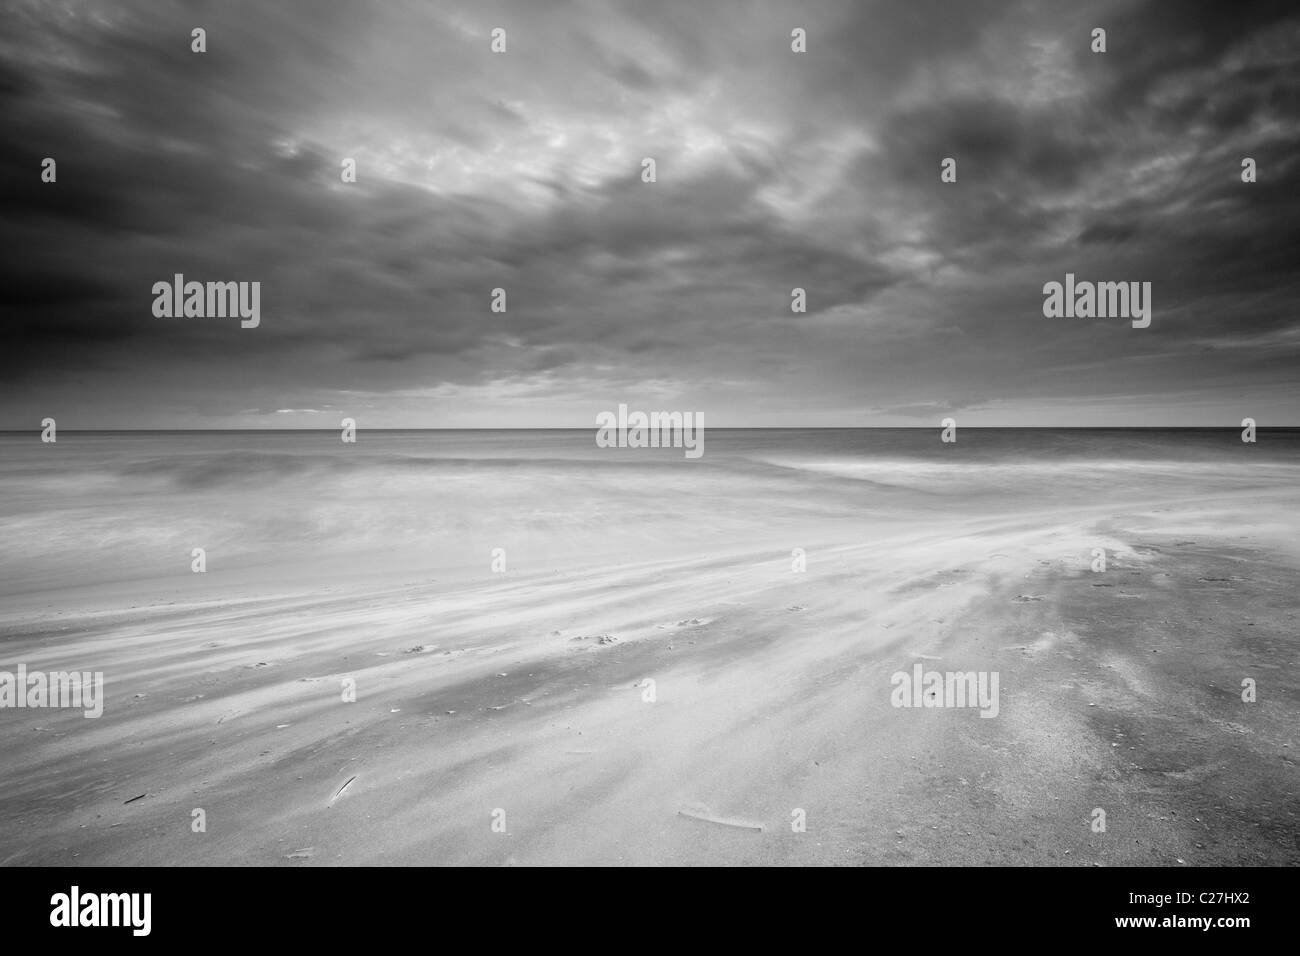 Sandstorm at Punta Chame, Pacific coast, Panama province, Republic of Panama. - Stock Image